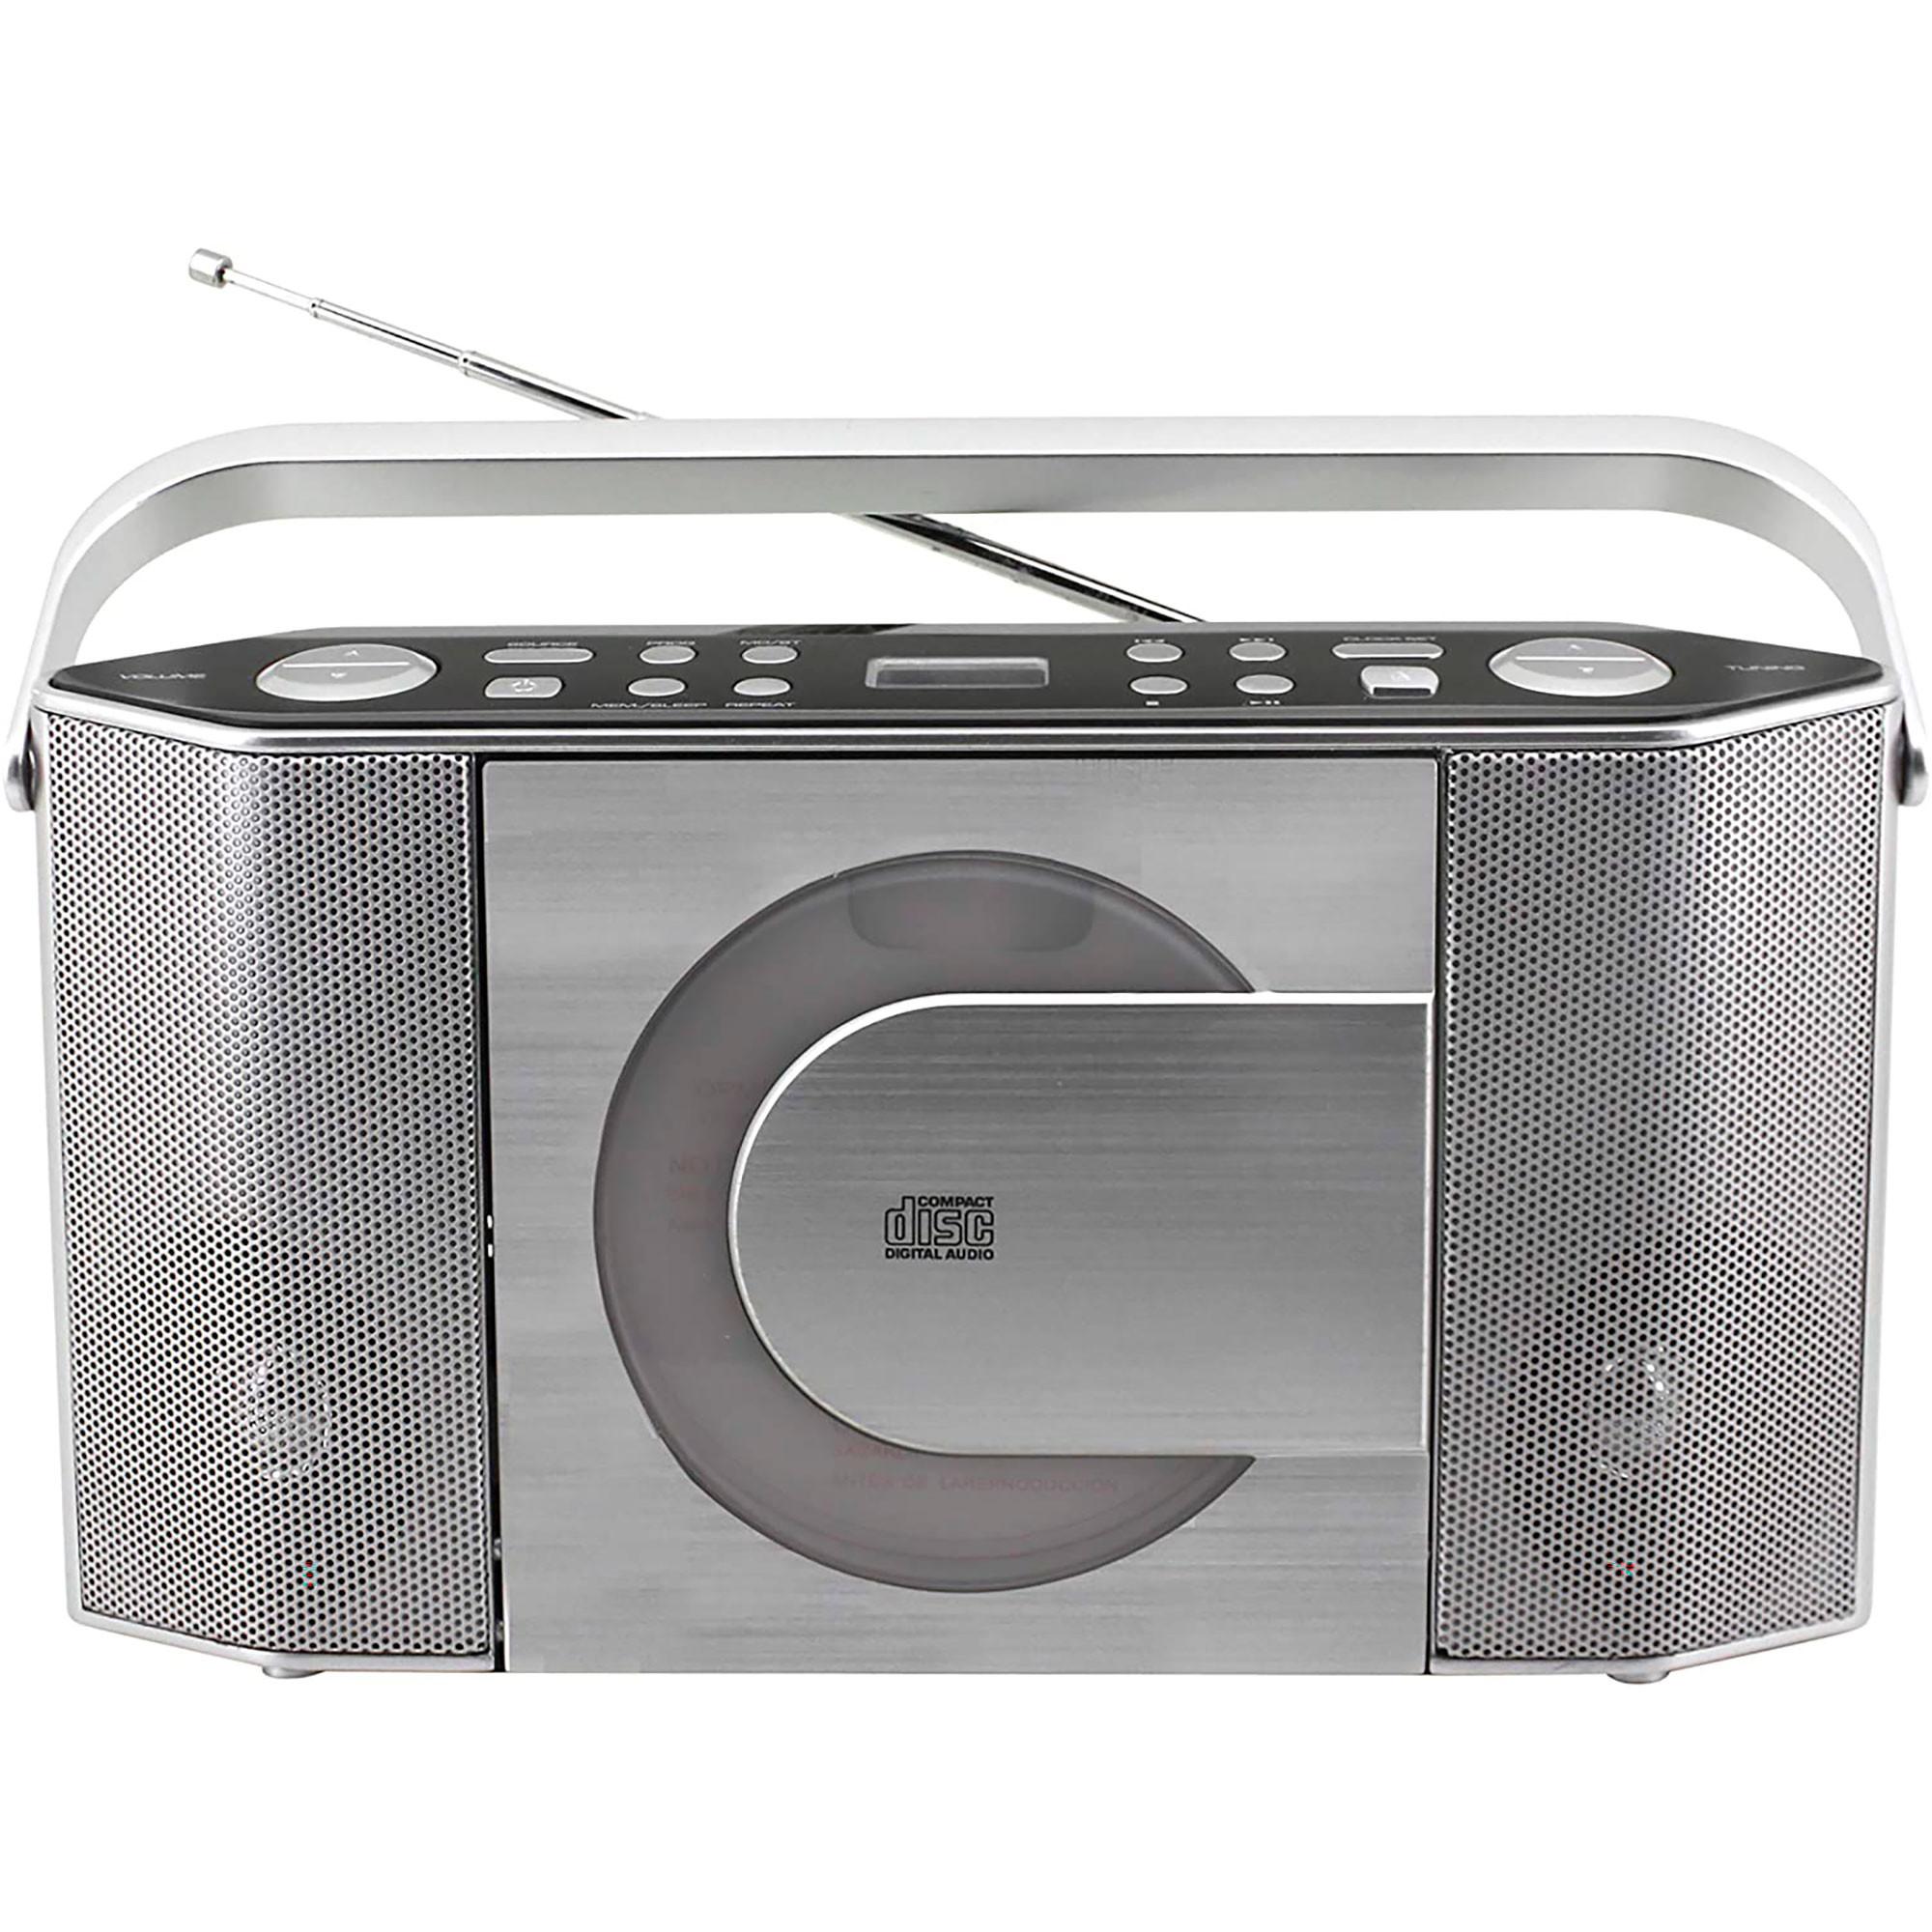 Soundmaster RCD1750SI Radio FM, PLL, Reloj, Digital, Portátil, Reproductor CD, CD-R, CD-RW, MP3, Salida de Auriculares, Color Plata